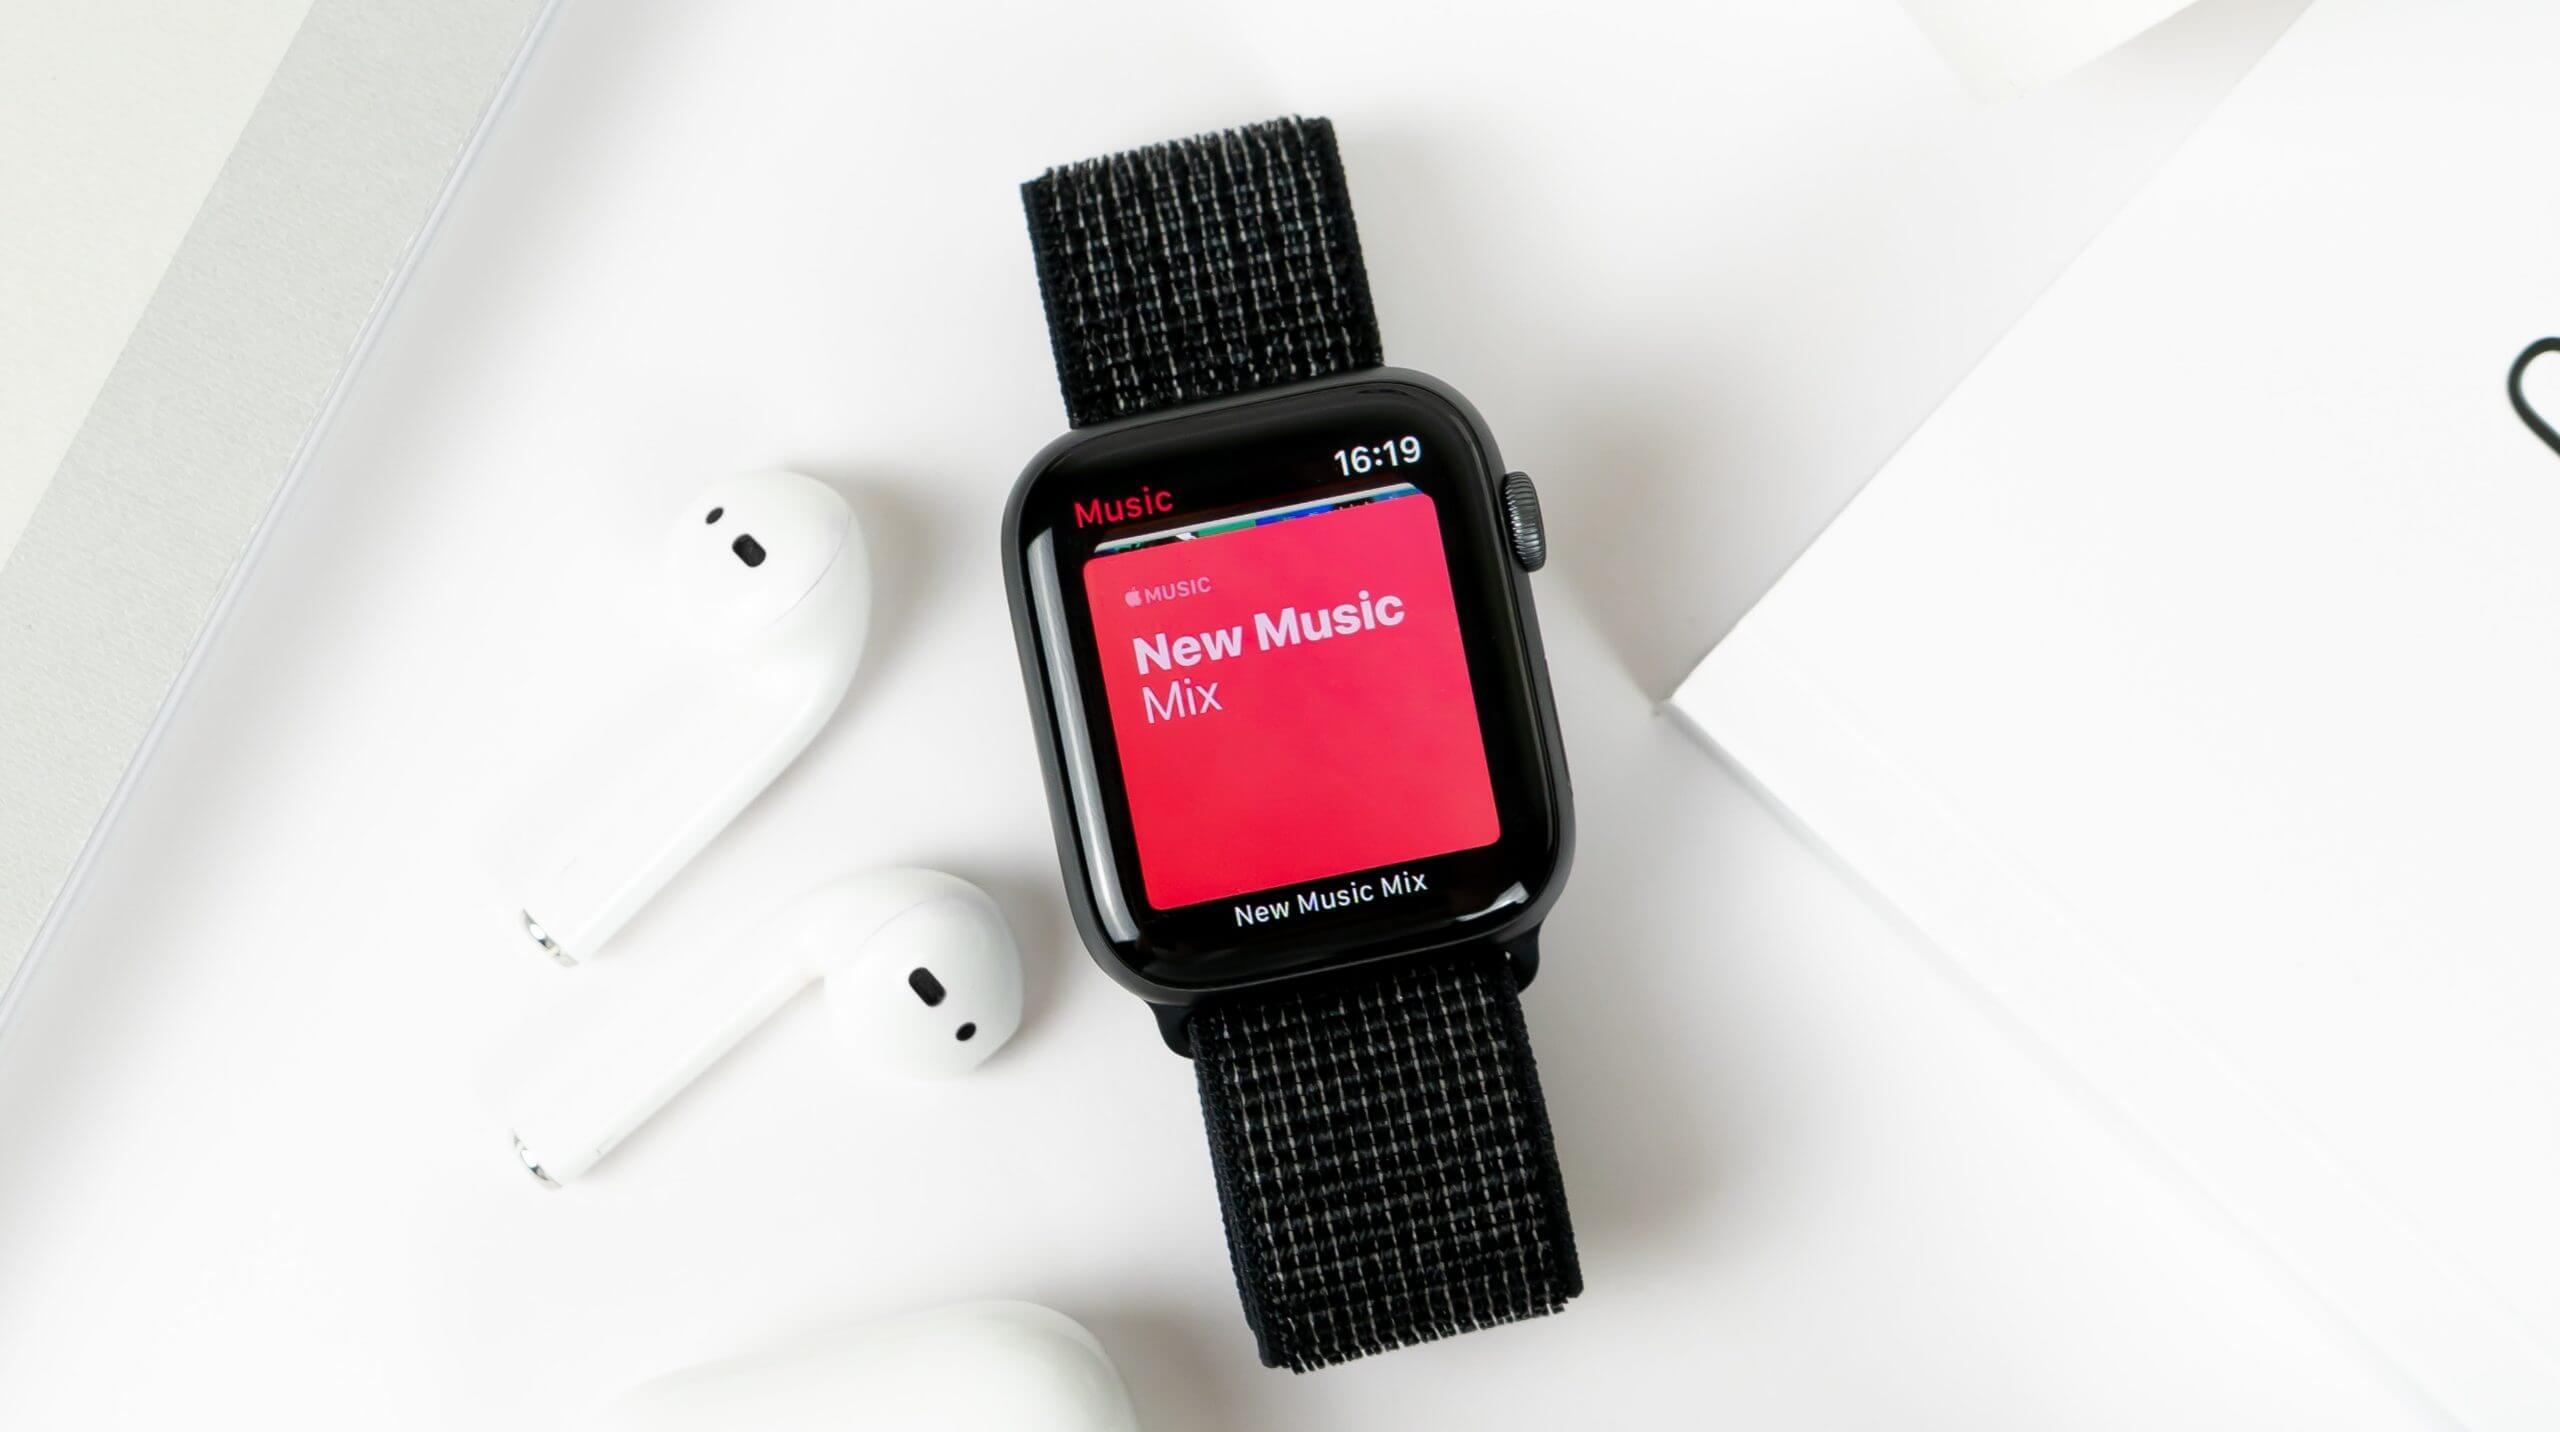 Apple Watchで音楽操作